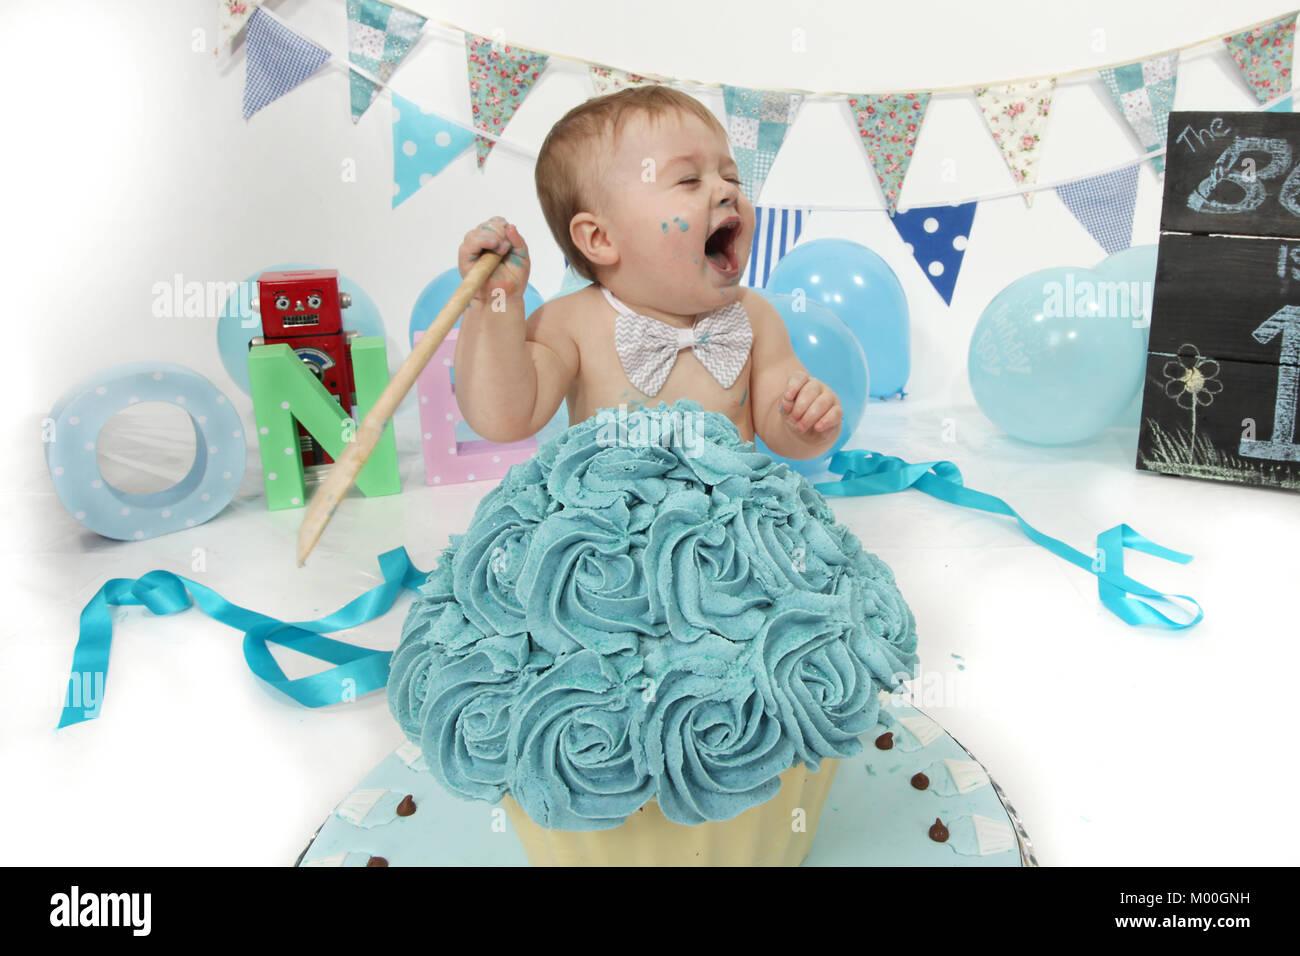 1 Year Old Boy Birthday Party Cake Smash Fun Food Stock Photo Alamy